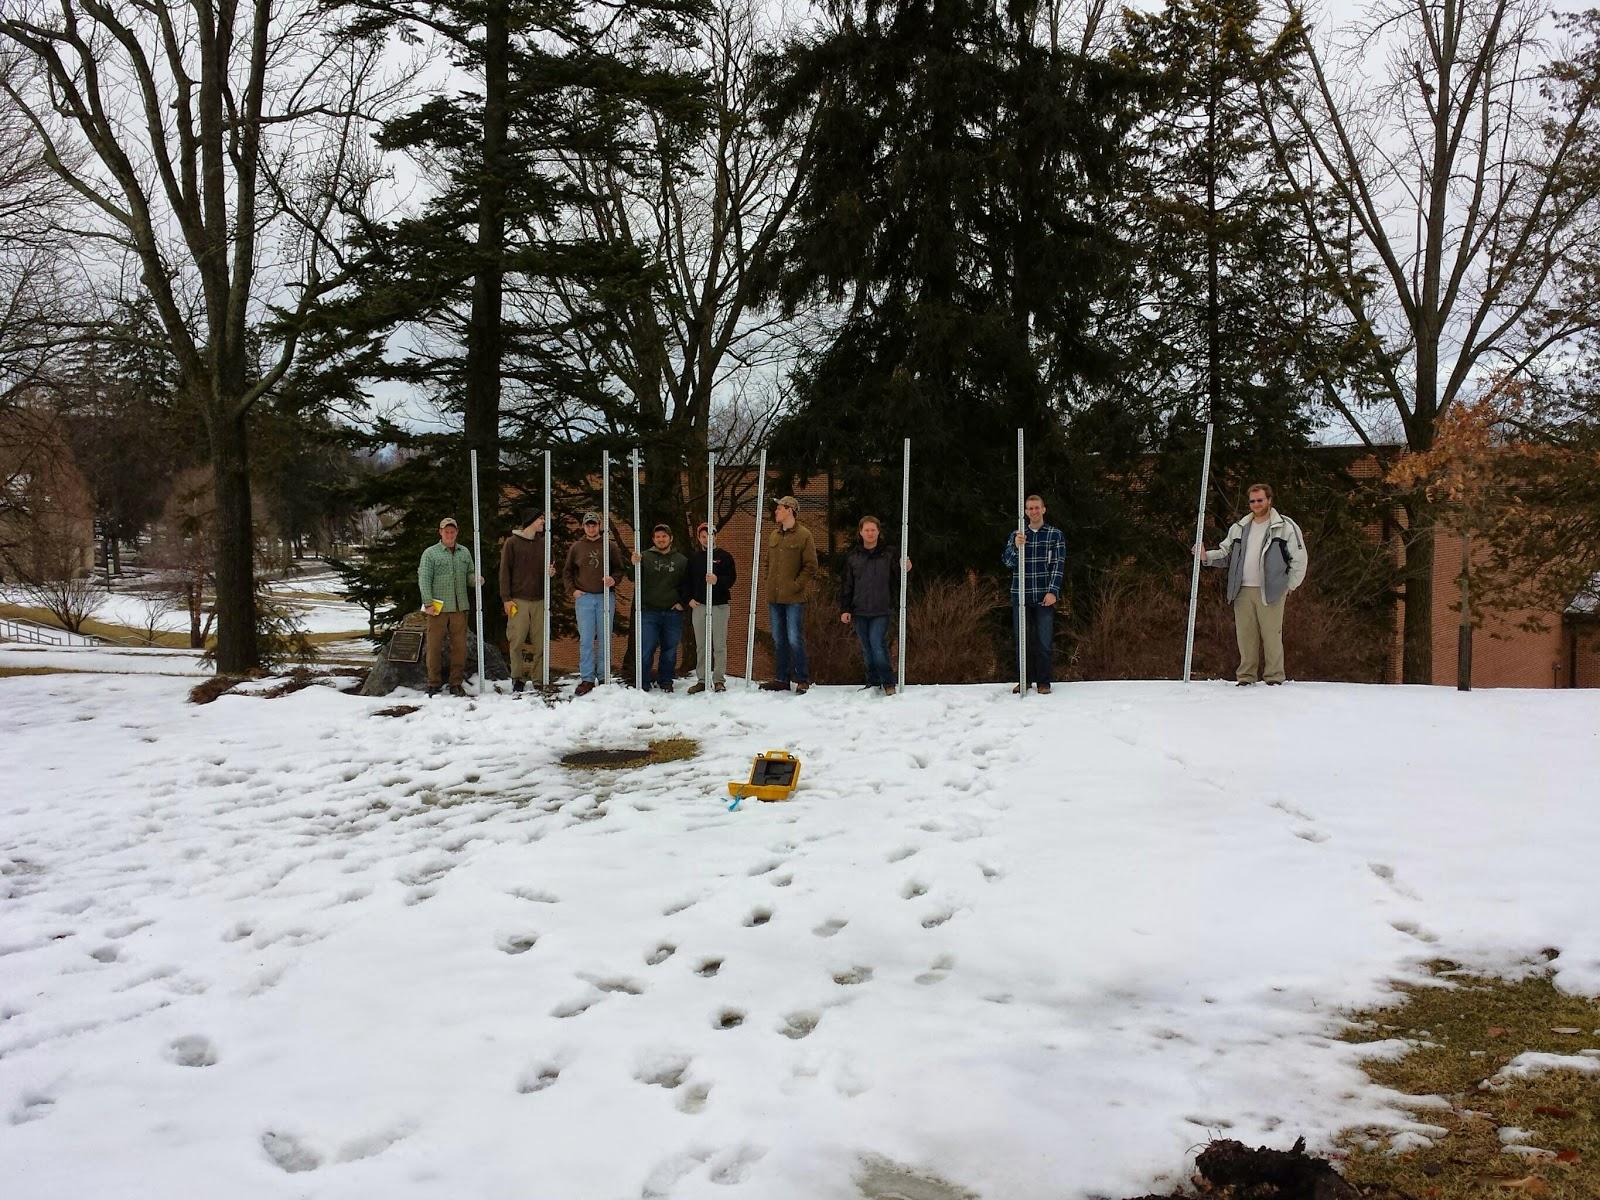 Swingers in mont alto pennsylvania